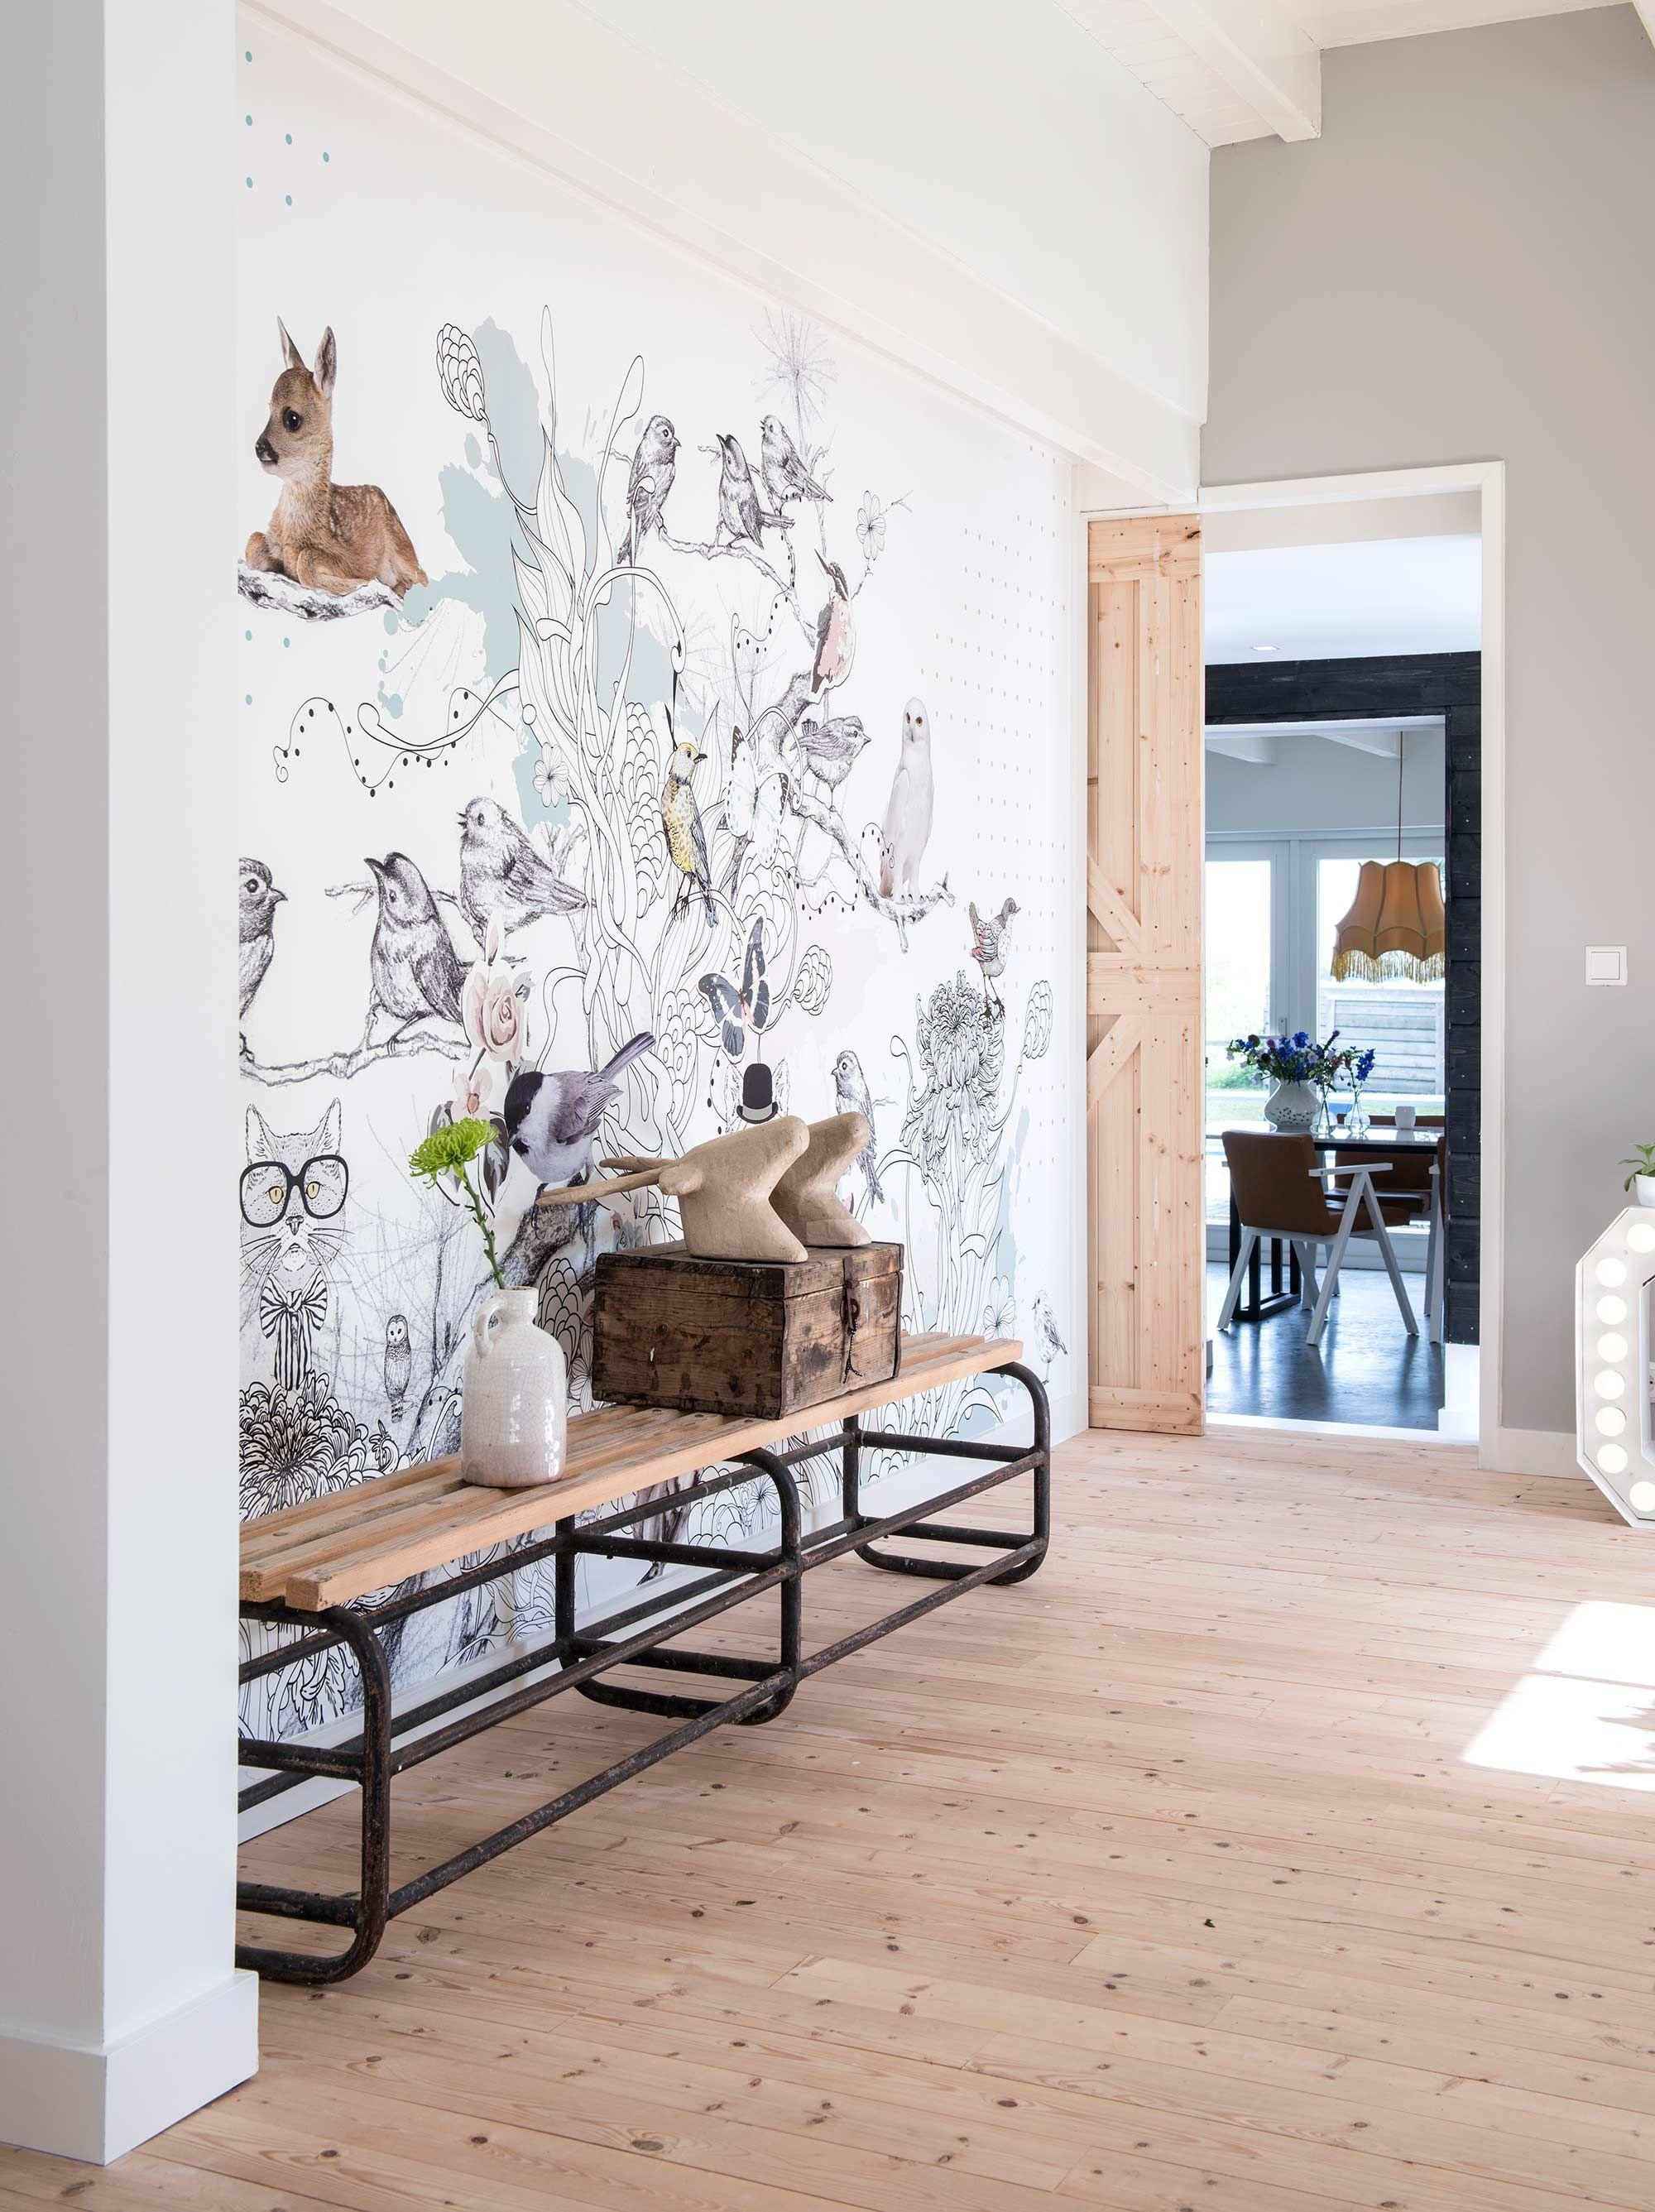 Wanddecoratie in hal wall decoration in hallway vtwonen